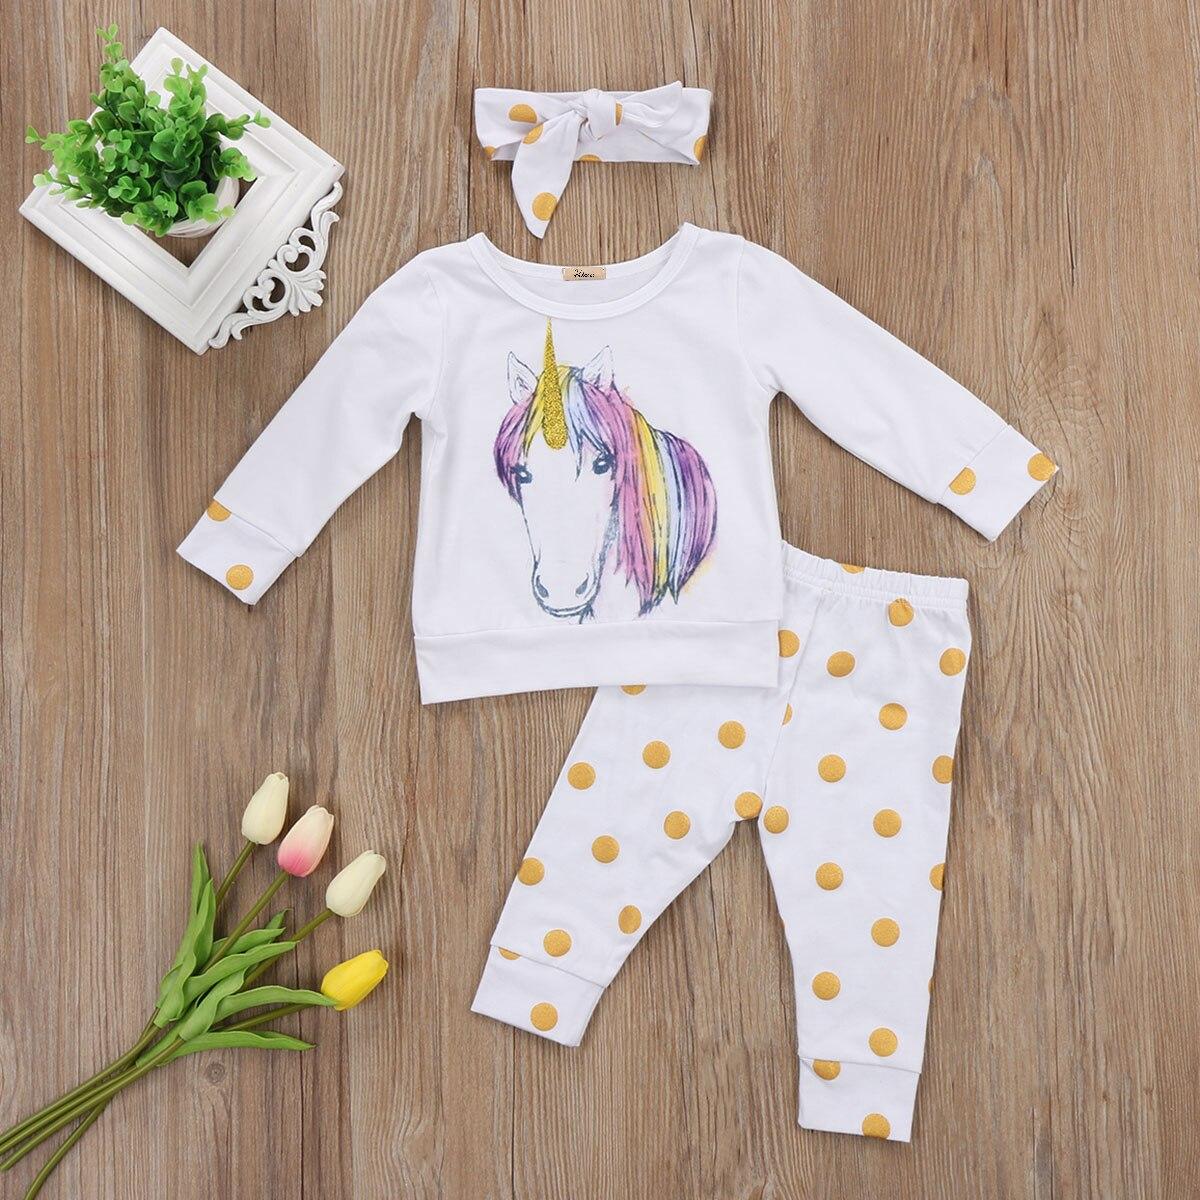 5912916aa3935 Cute Newborn Baby Girl Animal Print Outfits Long Sleeve Cotton T shirt Tops  Polka Dots Leggings Pants Headband 3pcs Clothes Set